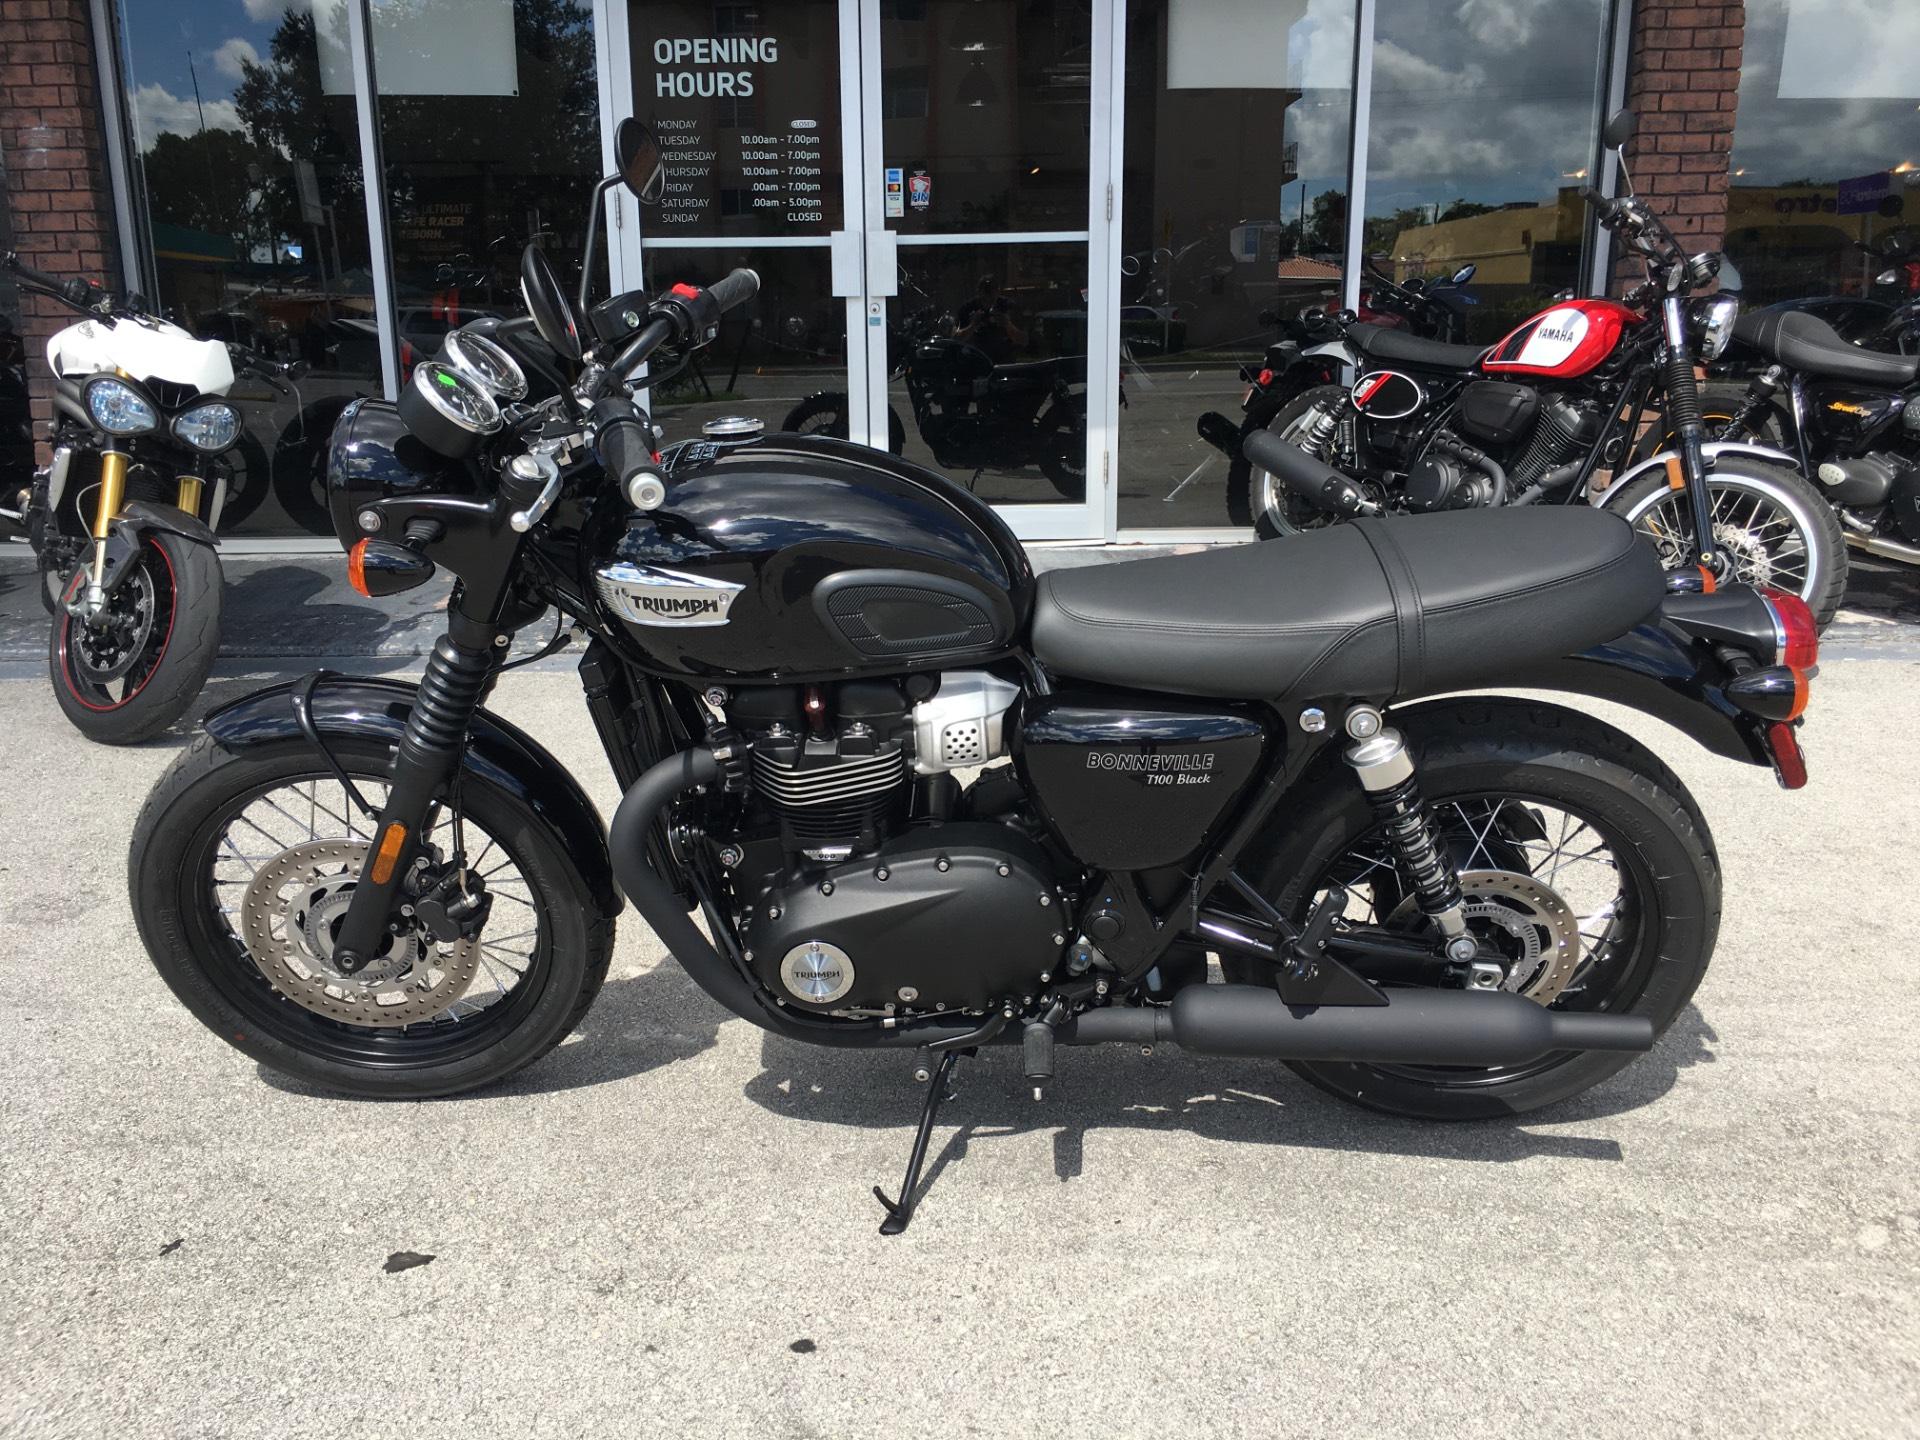 2018 Triumph Bonneville T100 Black Motorcycles Miami Florida Tri859076